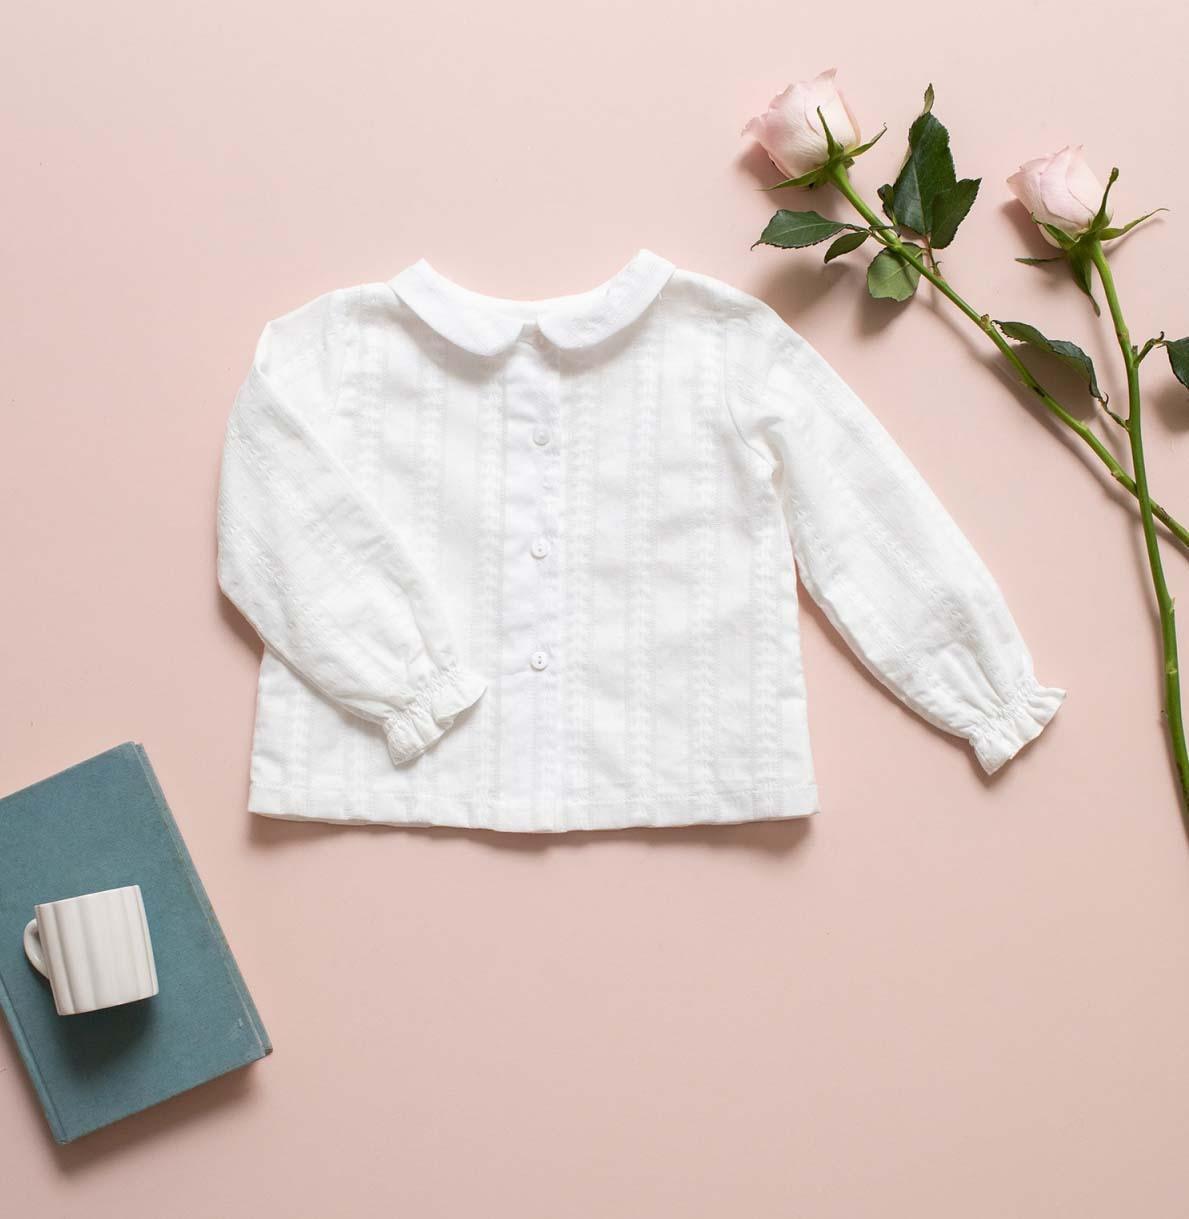 Camisa cuello bebe bordada Emilia